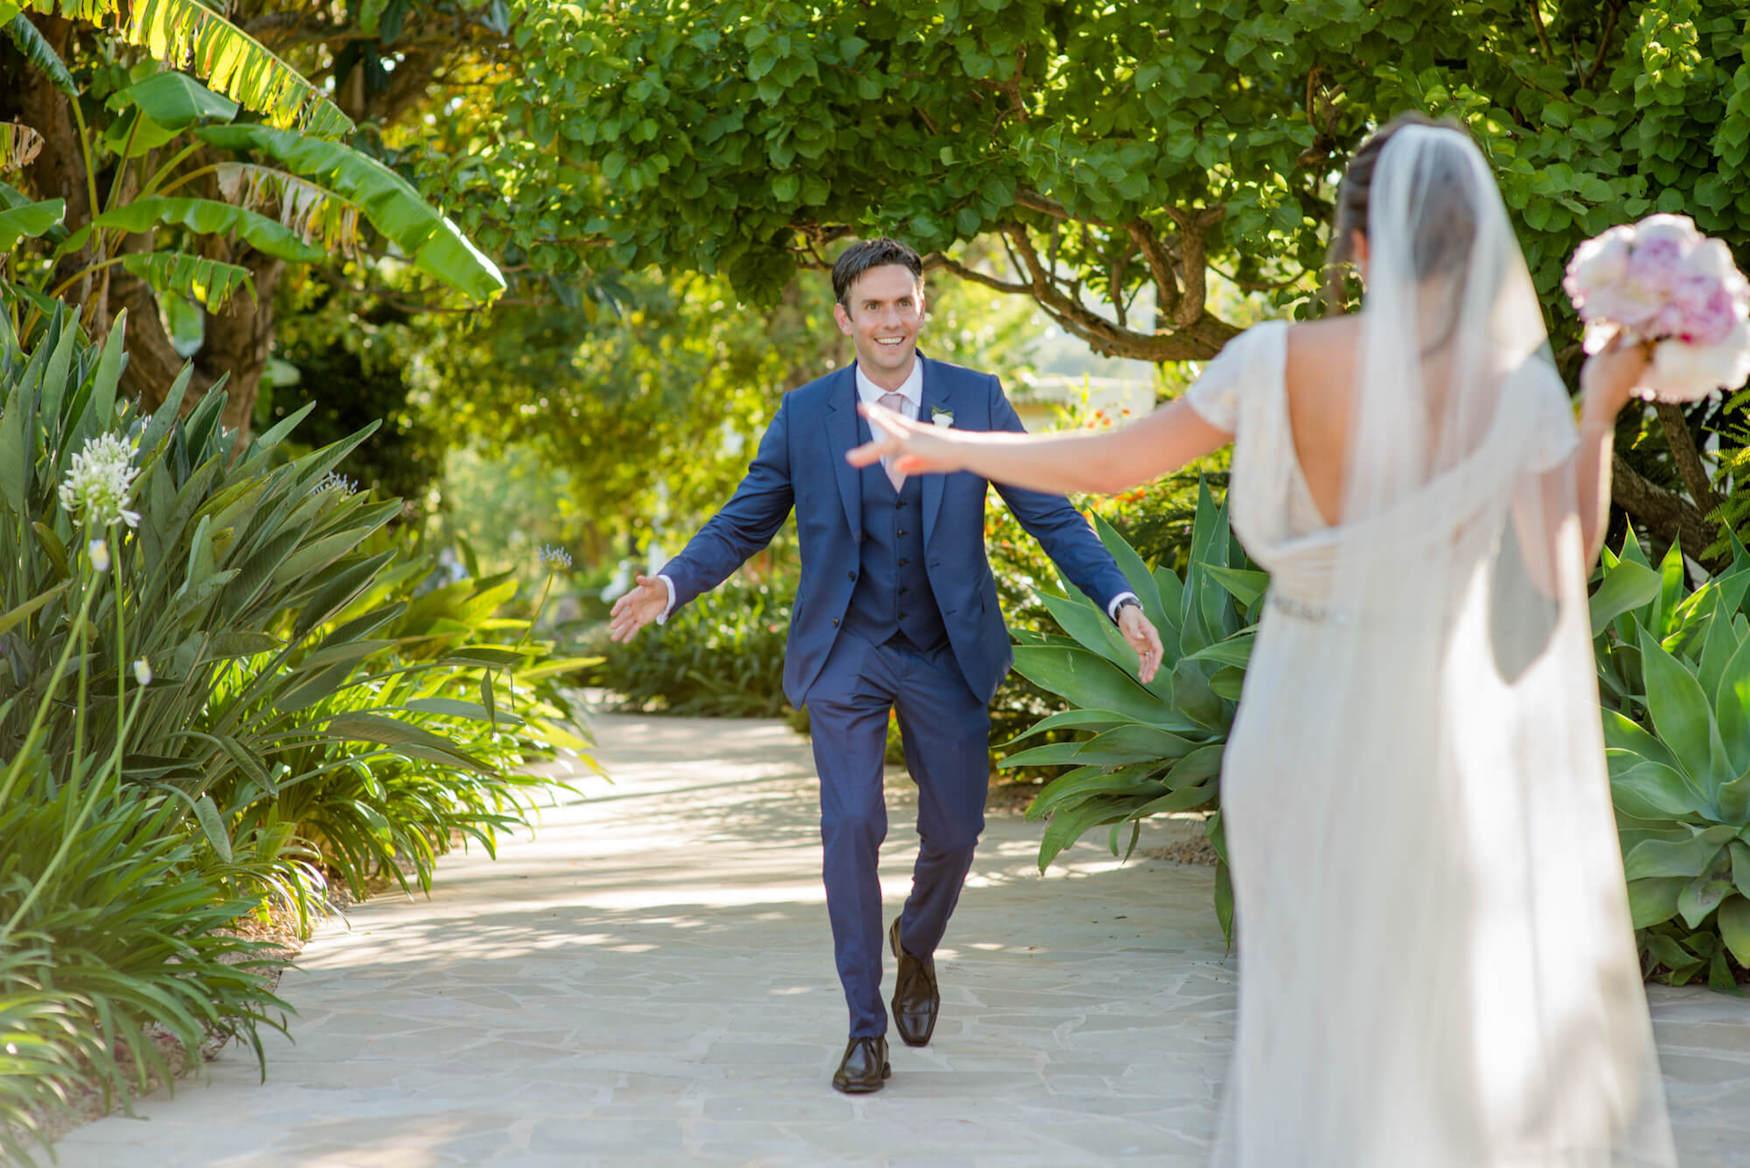 bride groom laughter lush green garden path dapled light eliza jane howell veil